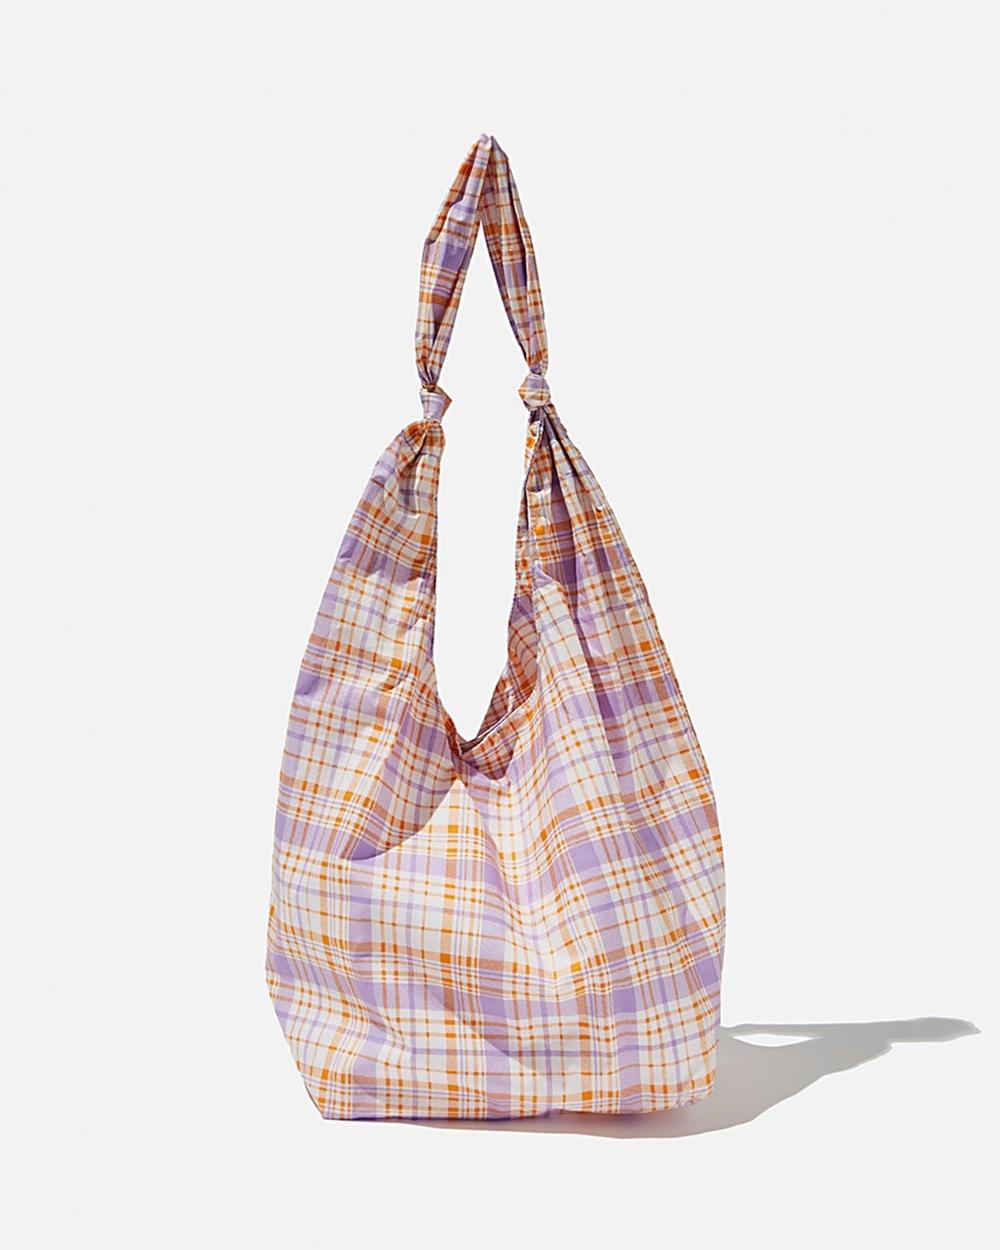 Rubi Endless Summer Slouch Tote Teens Bags Powder Lilac & Sweet Orange